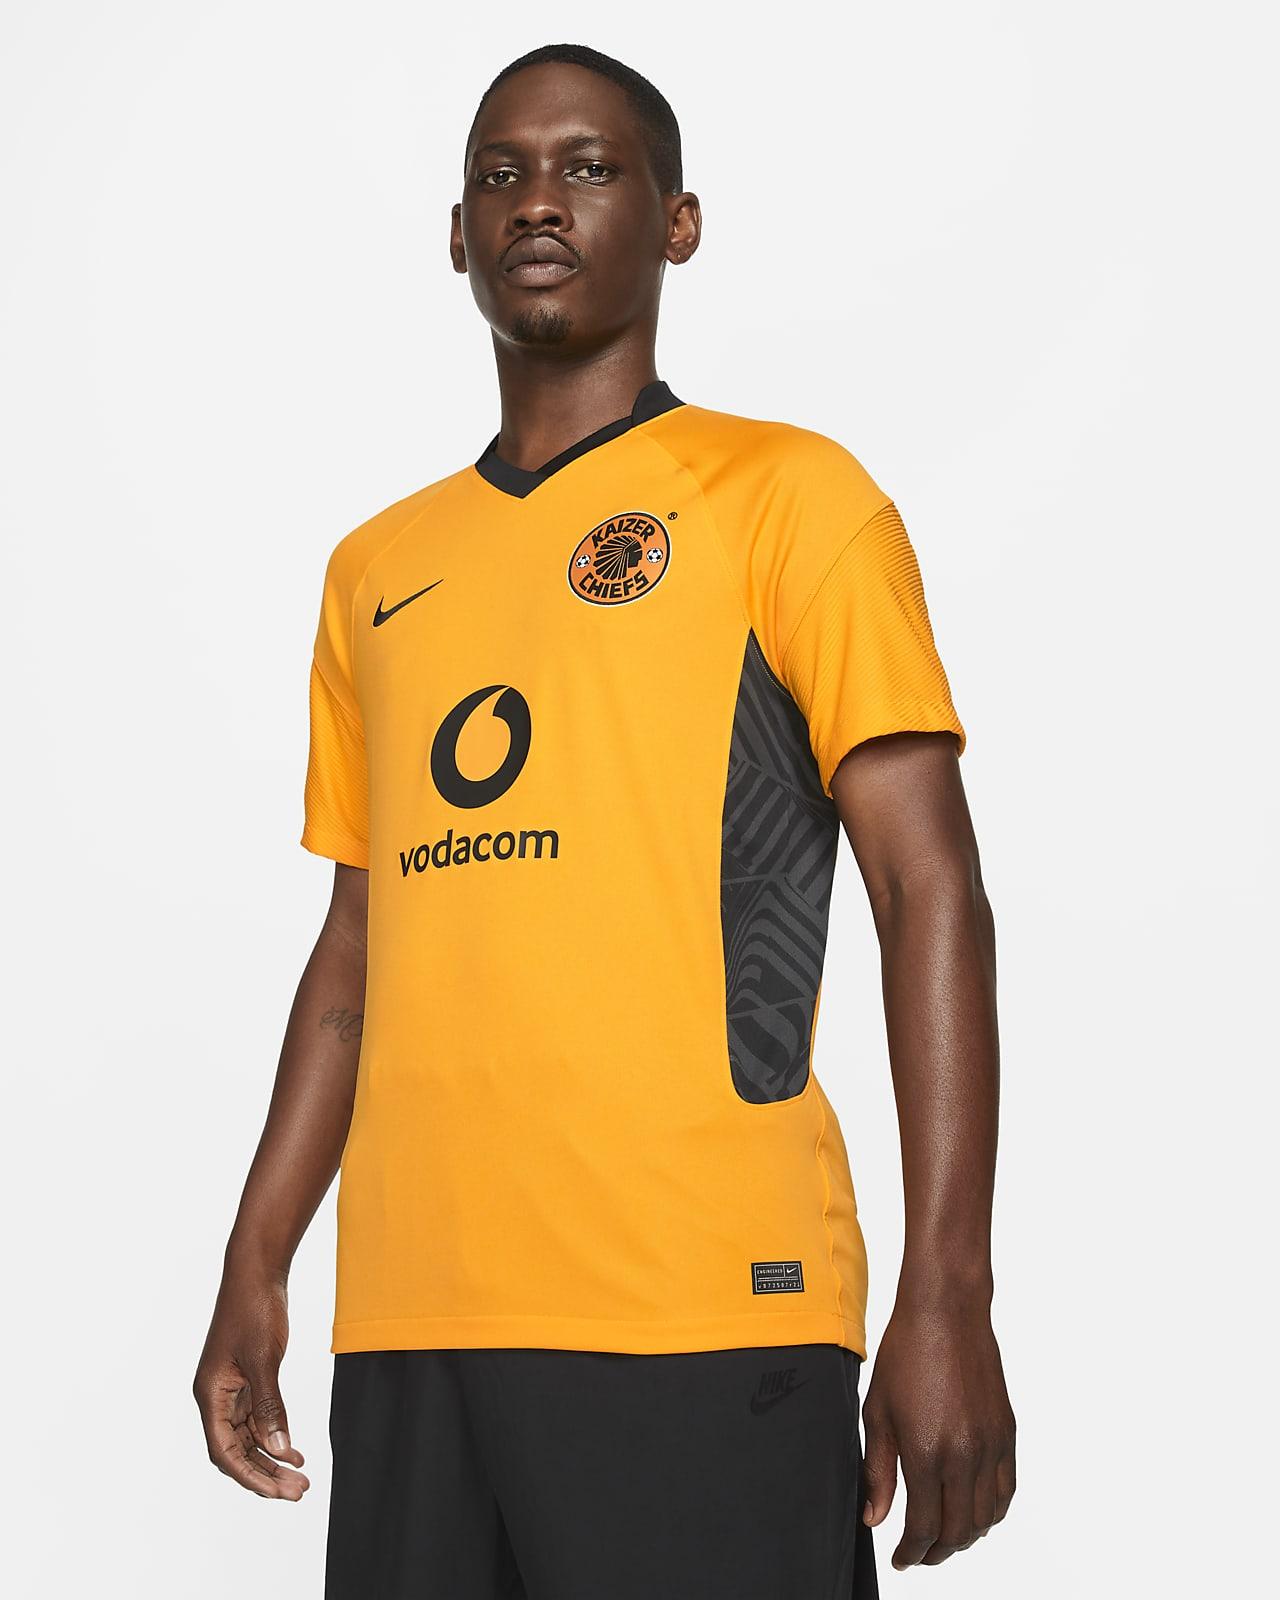 Maglia da calcio Nike Dri-FIT Kaizer Chiefs F.C. 2021/22 Stadium da uomo - Home